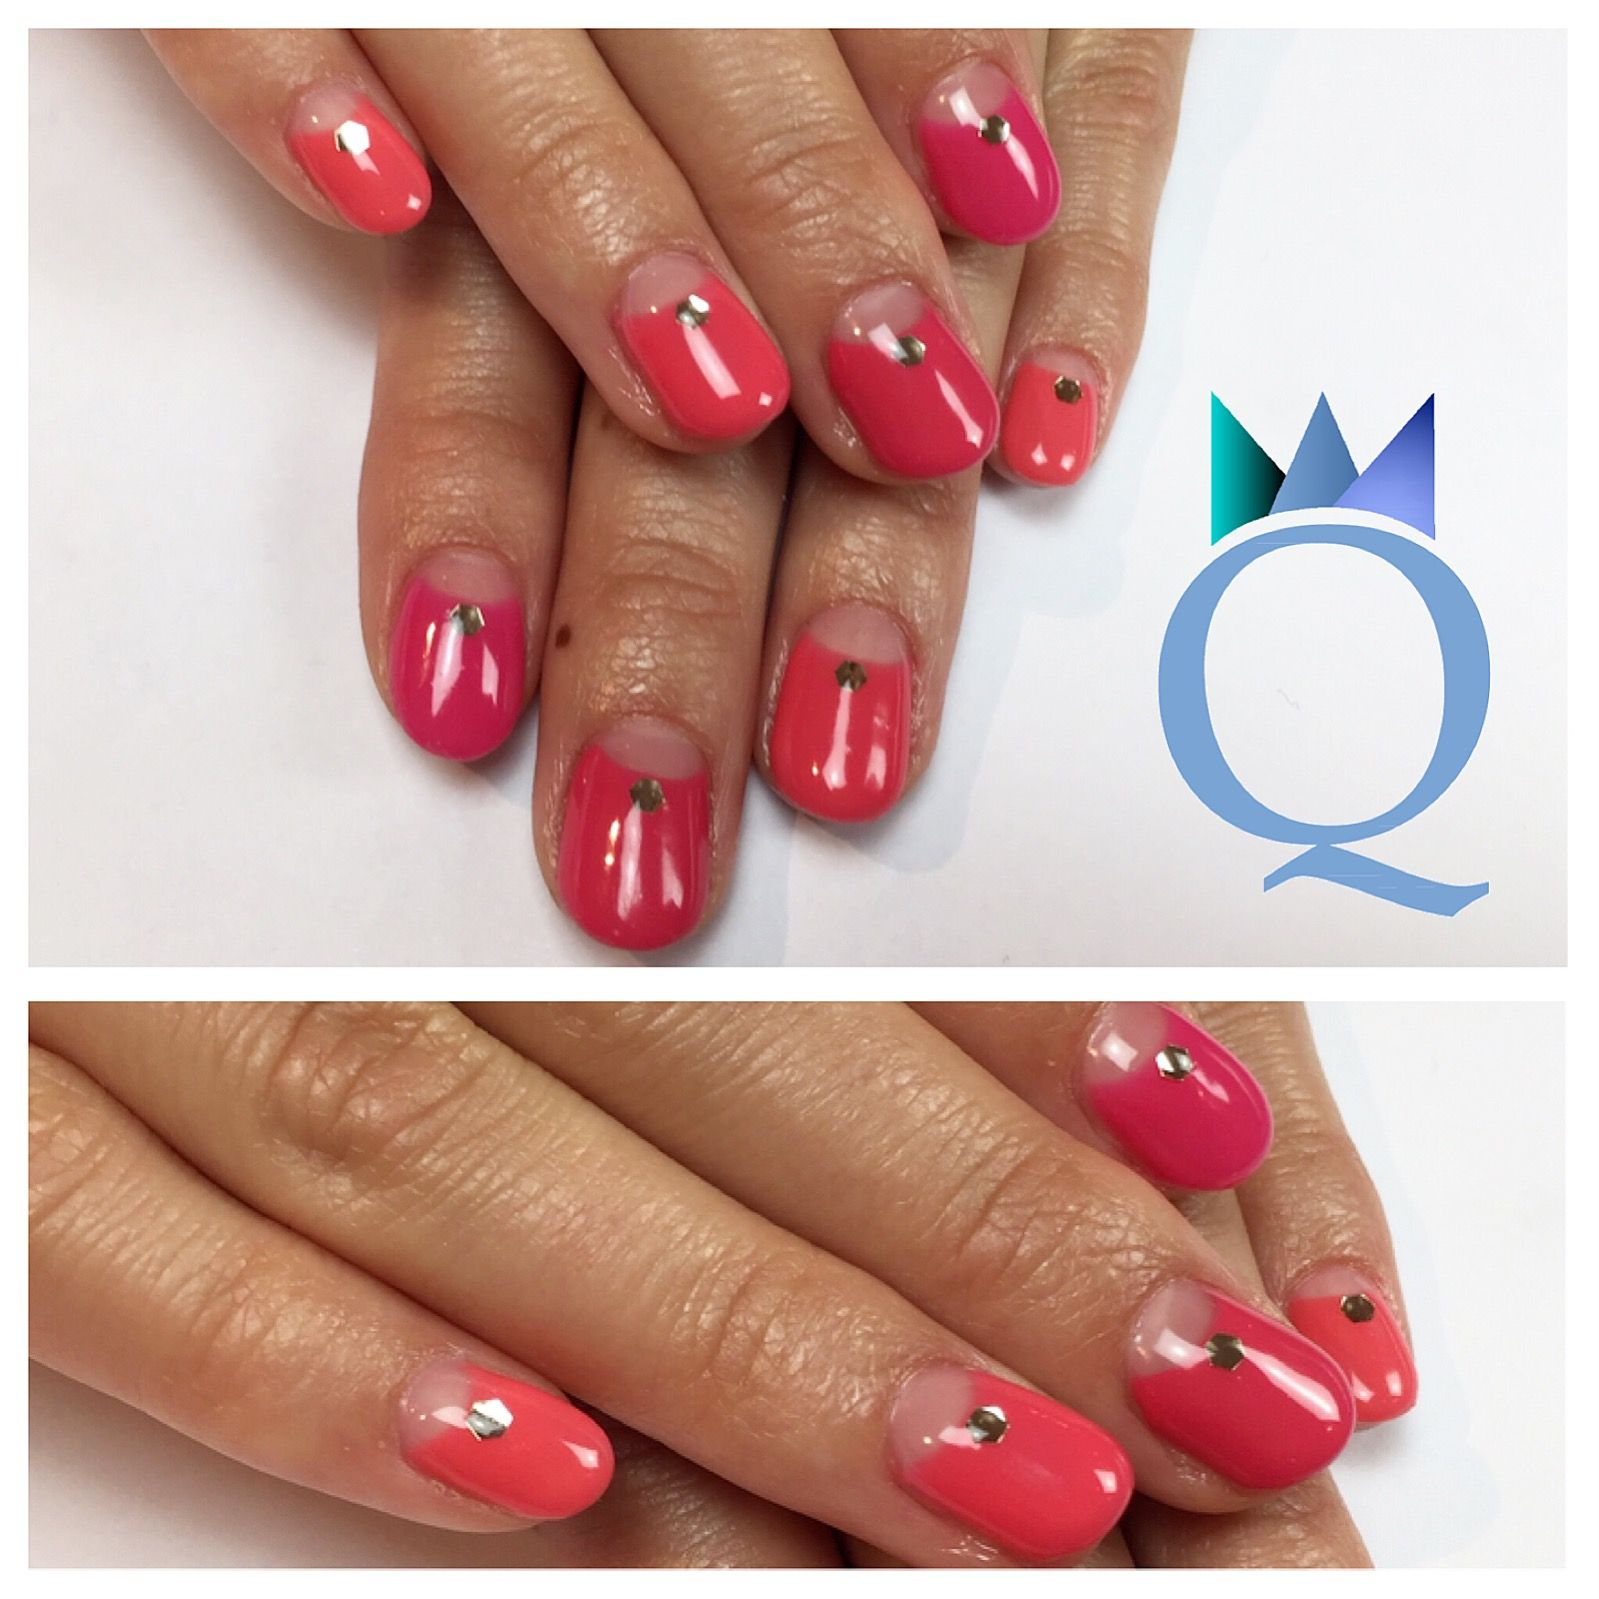 shortnails #gelnails #nails #coral #shades #kurzenägel #gelnägel ...